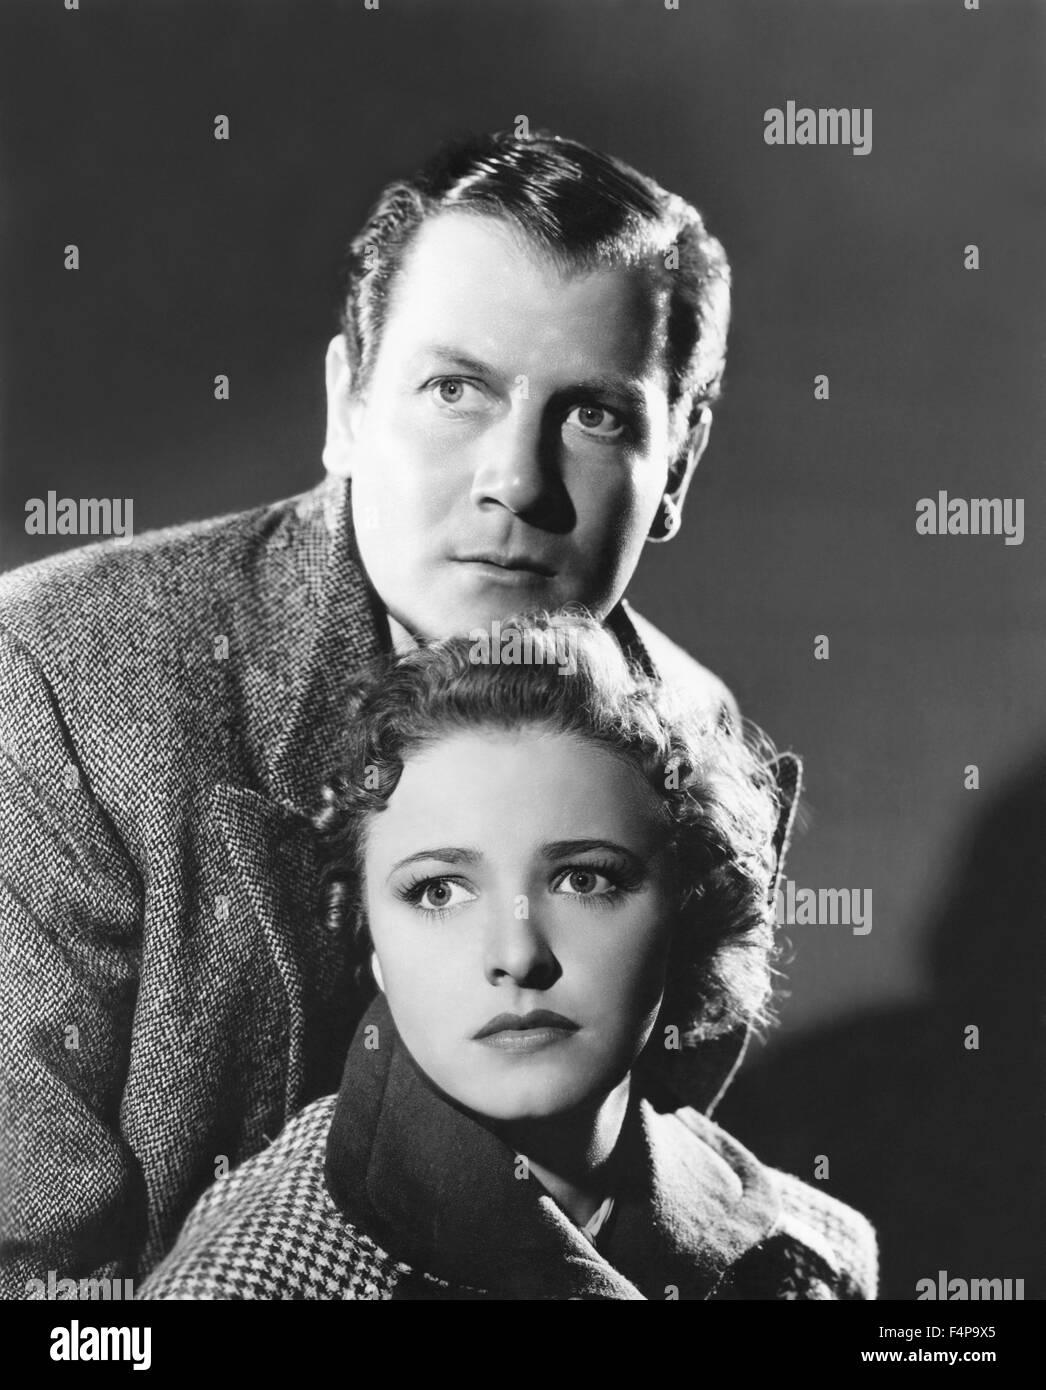 Joel Mc Crea, Laraine Dey / Foreign Correspondent 1940 directed by Alfred Hitchcock - Stock Image